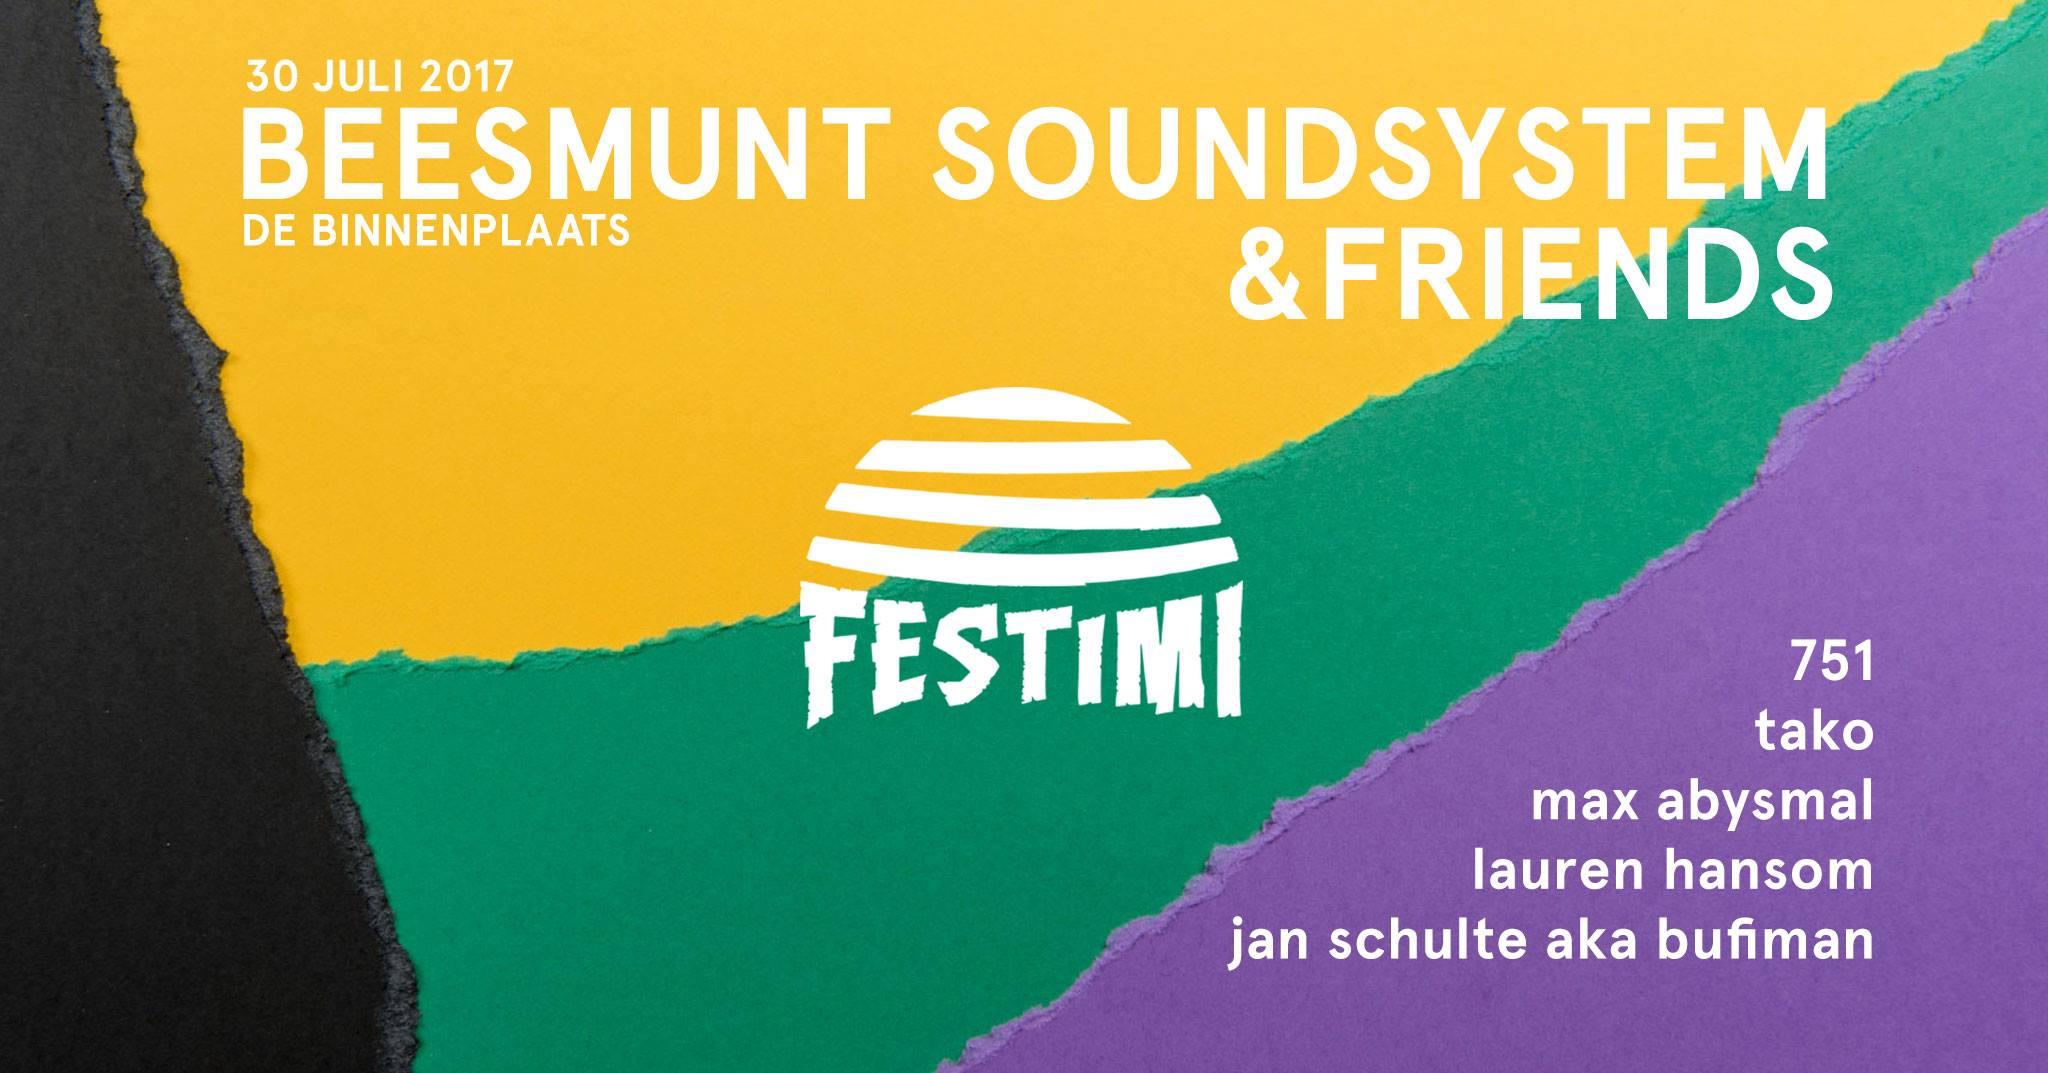 Festimi | Beesmunt Soundsystem & Friends - 30 juli 2017